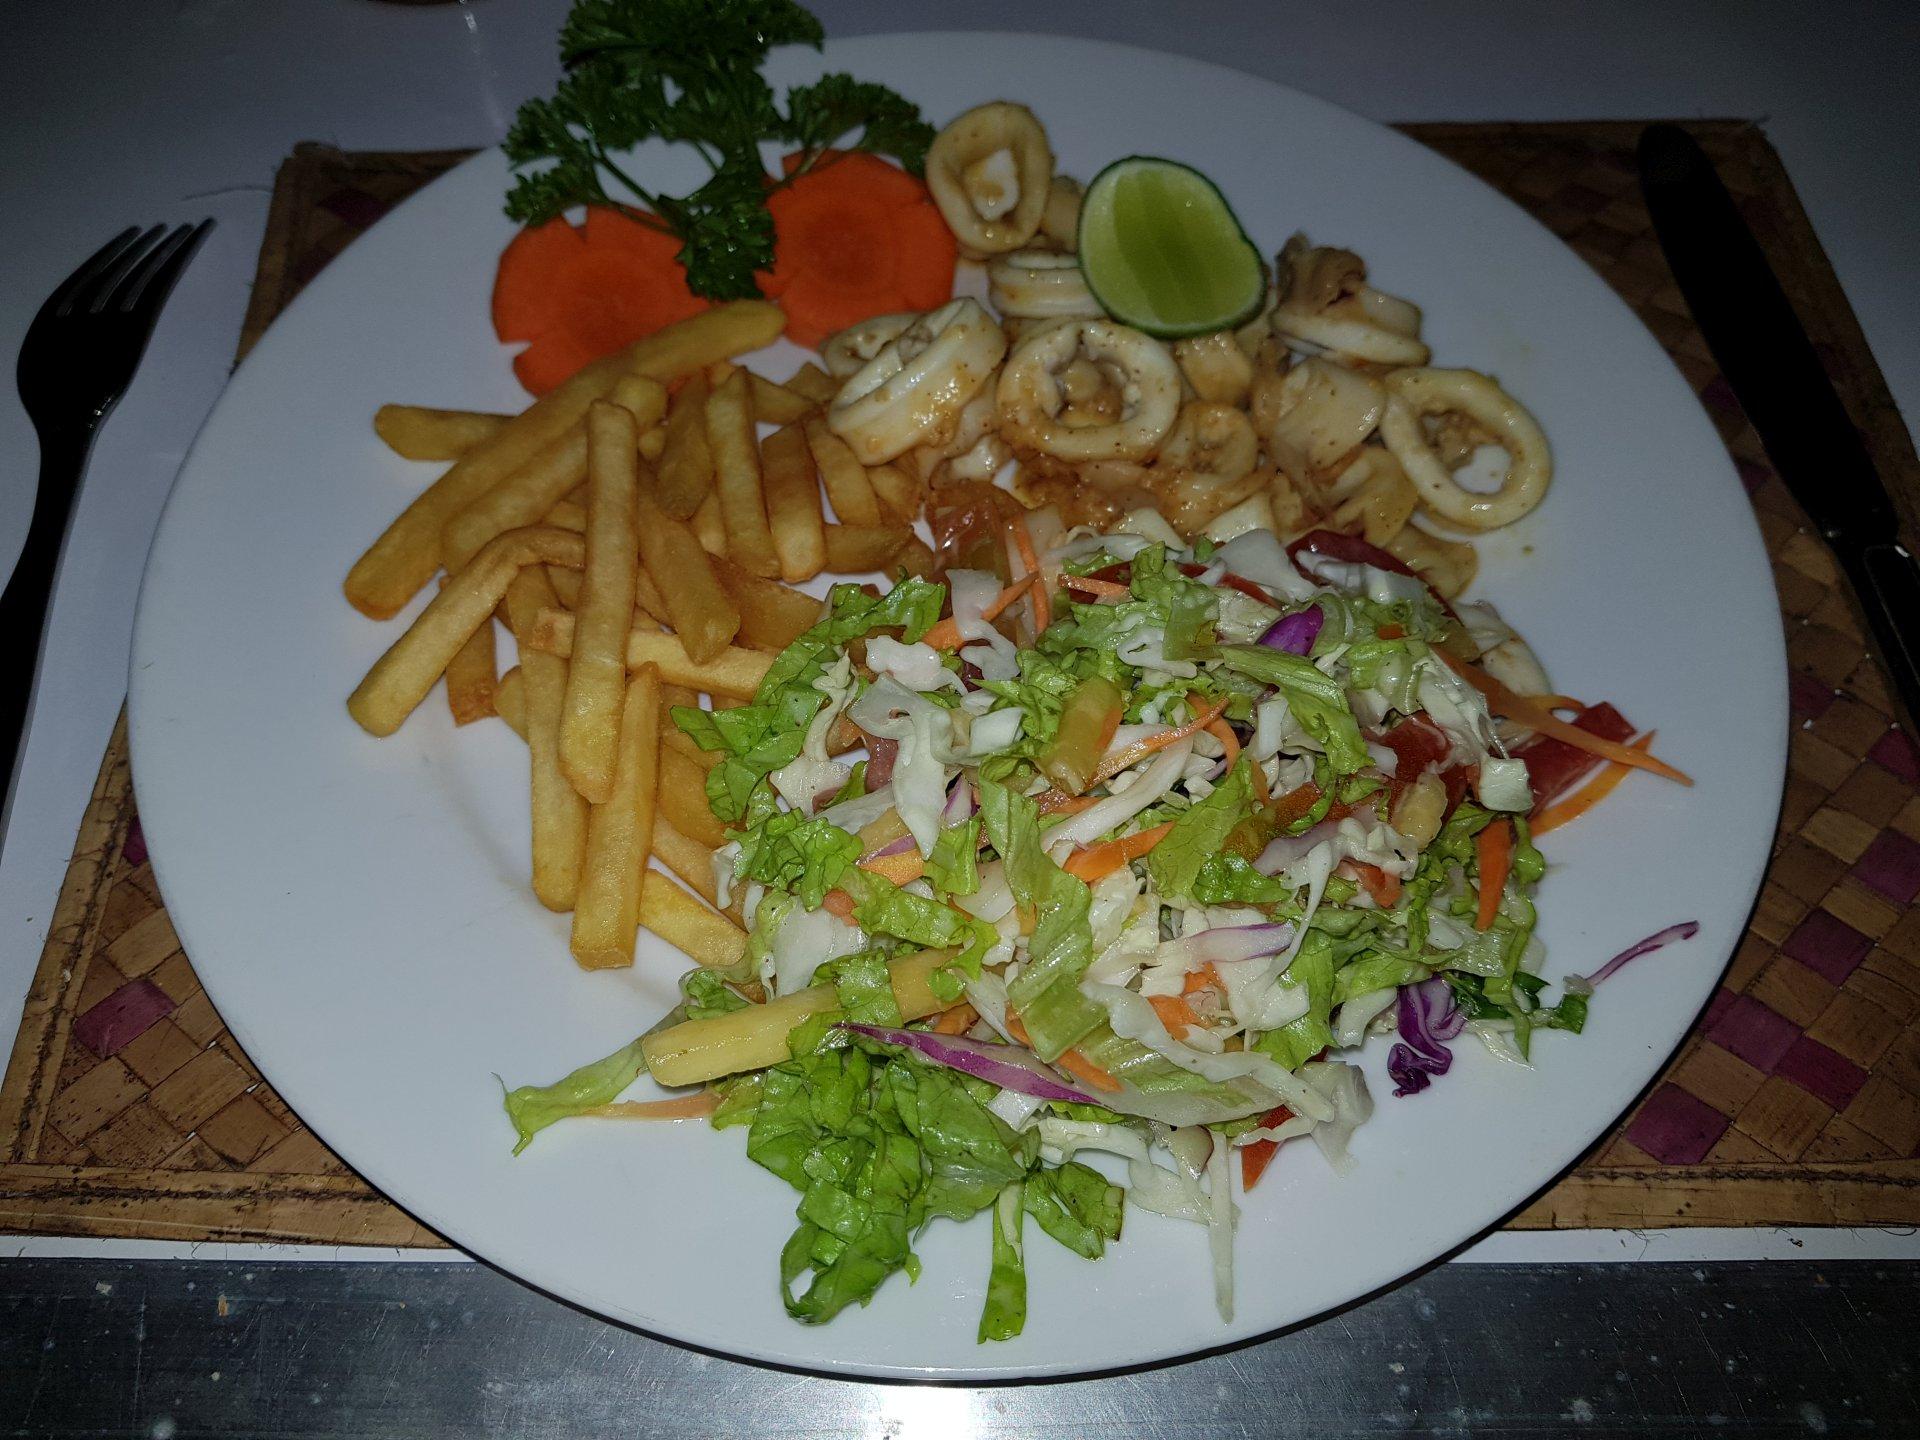 жареные кальмары с салатом и картофелем